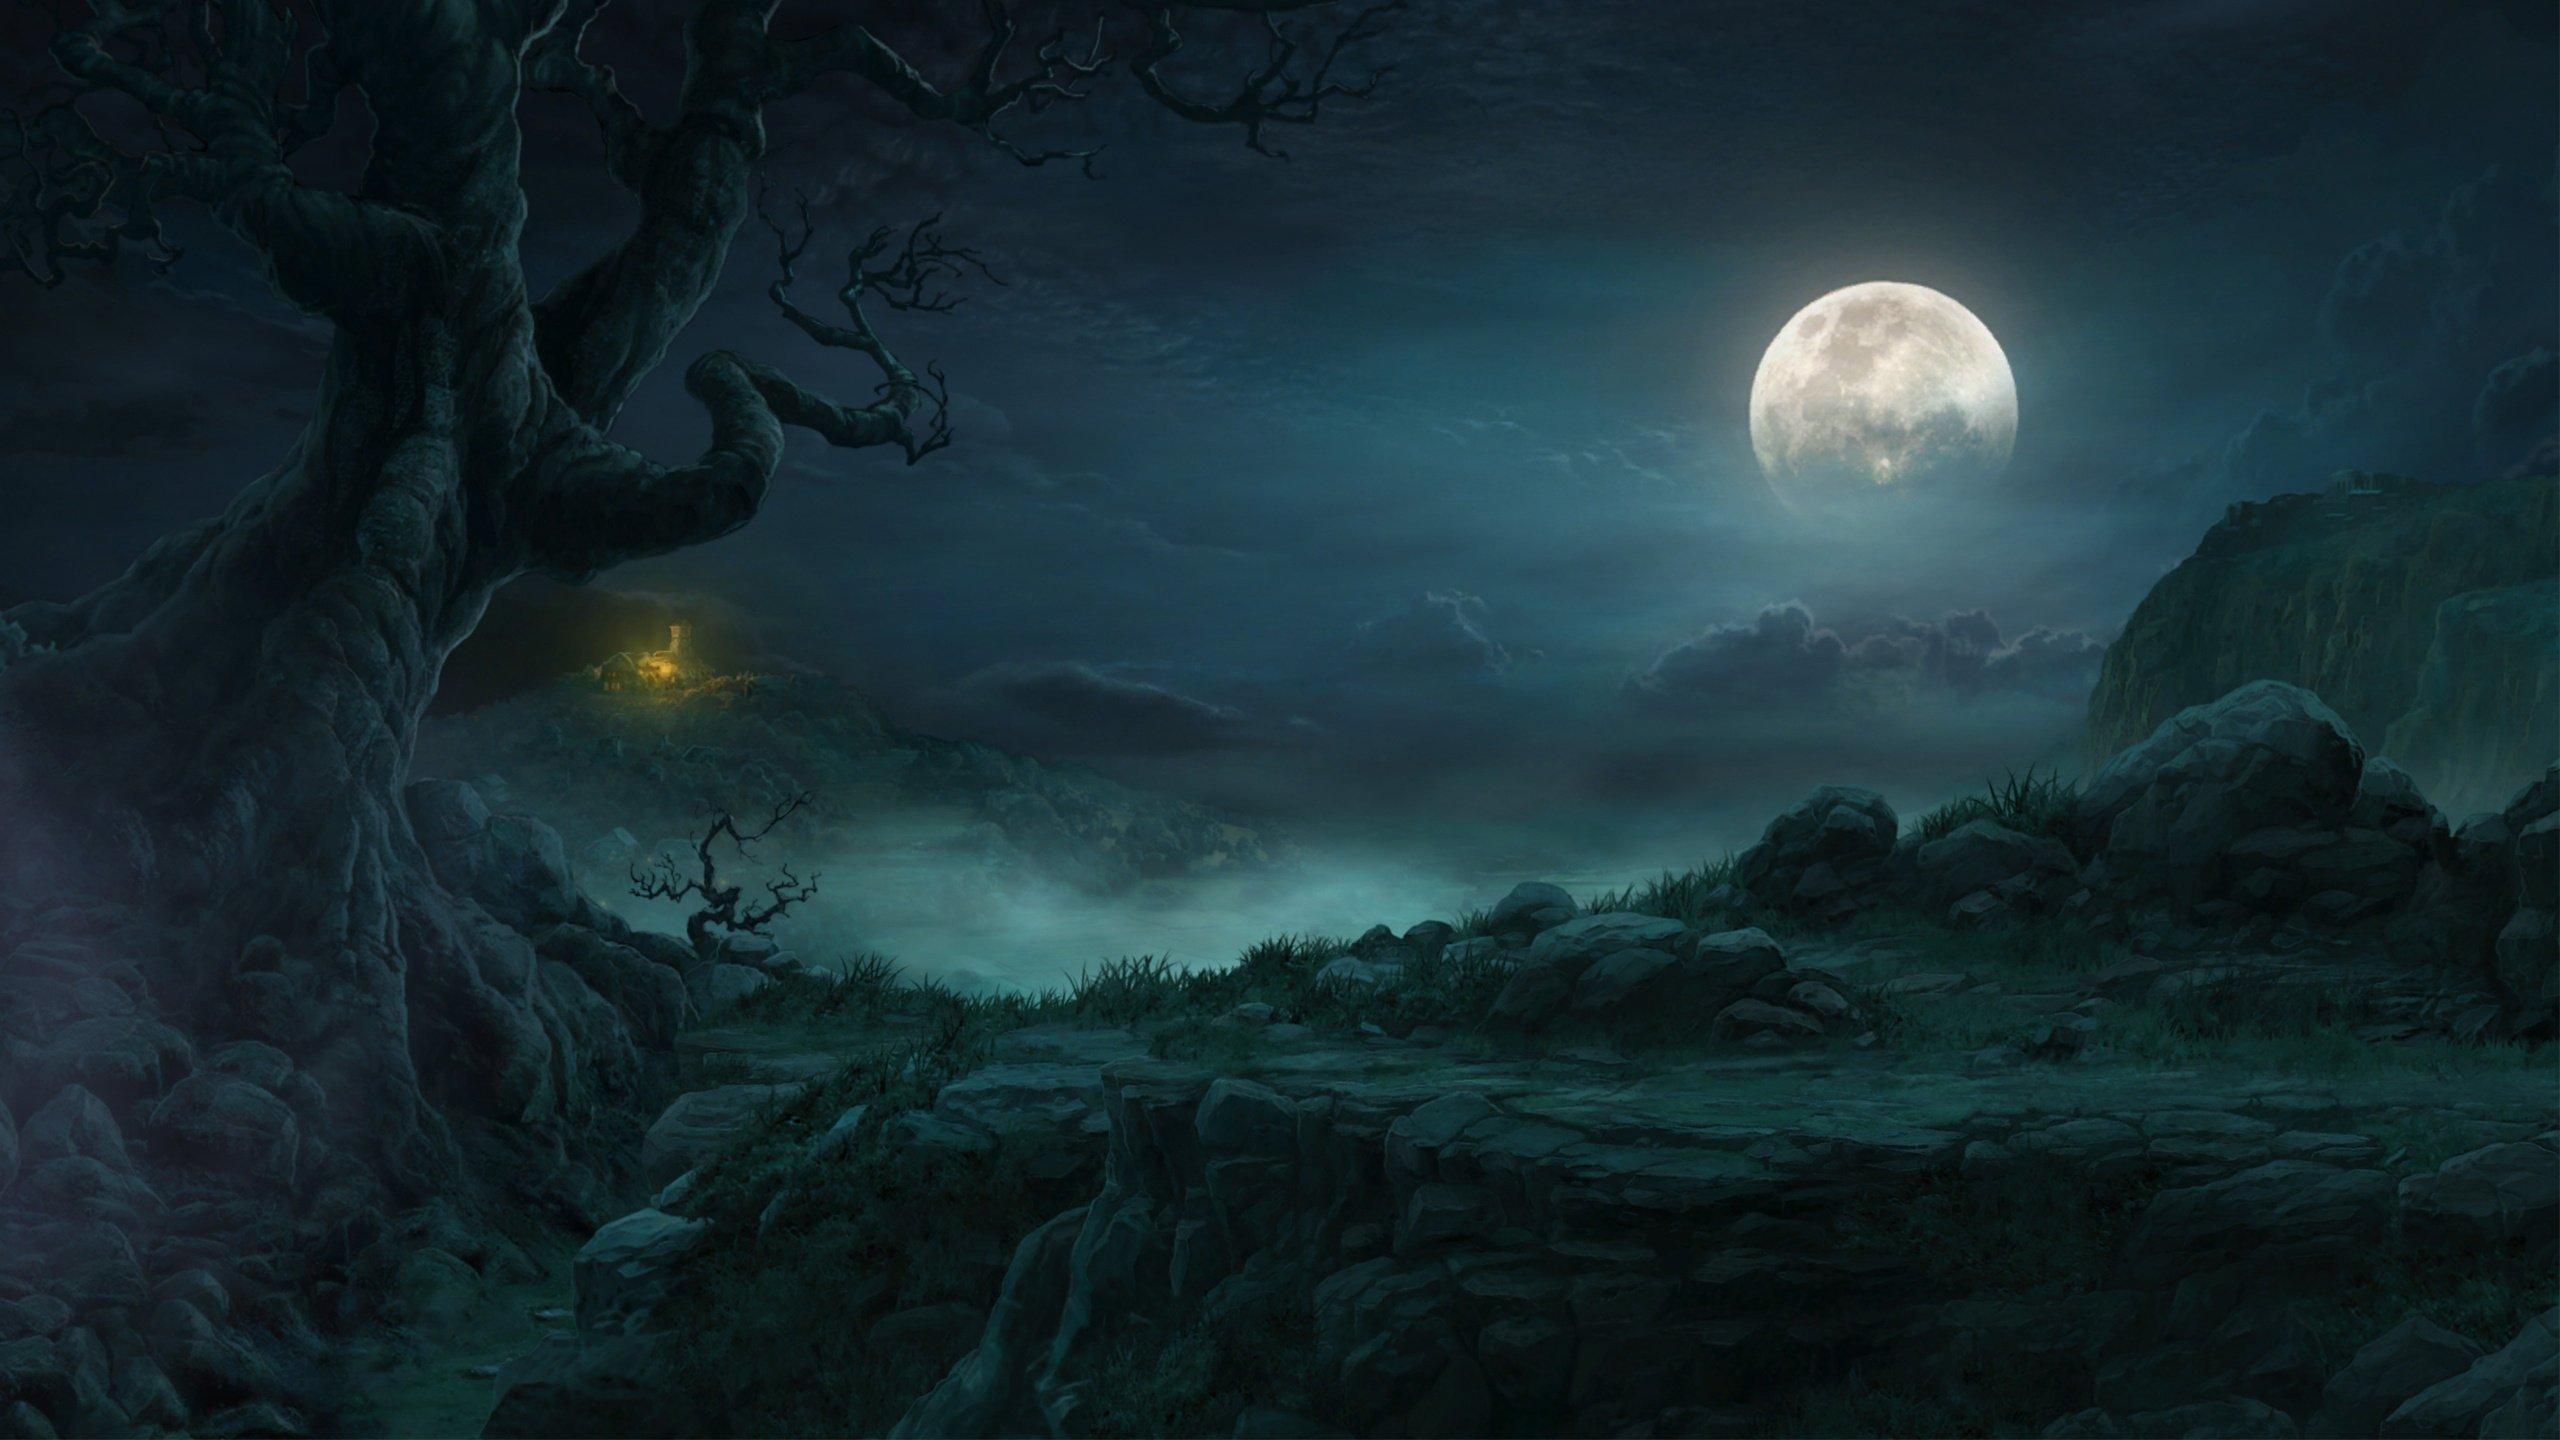 original landscape moon night - photo #18